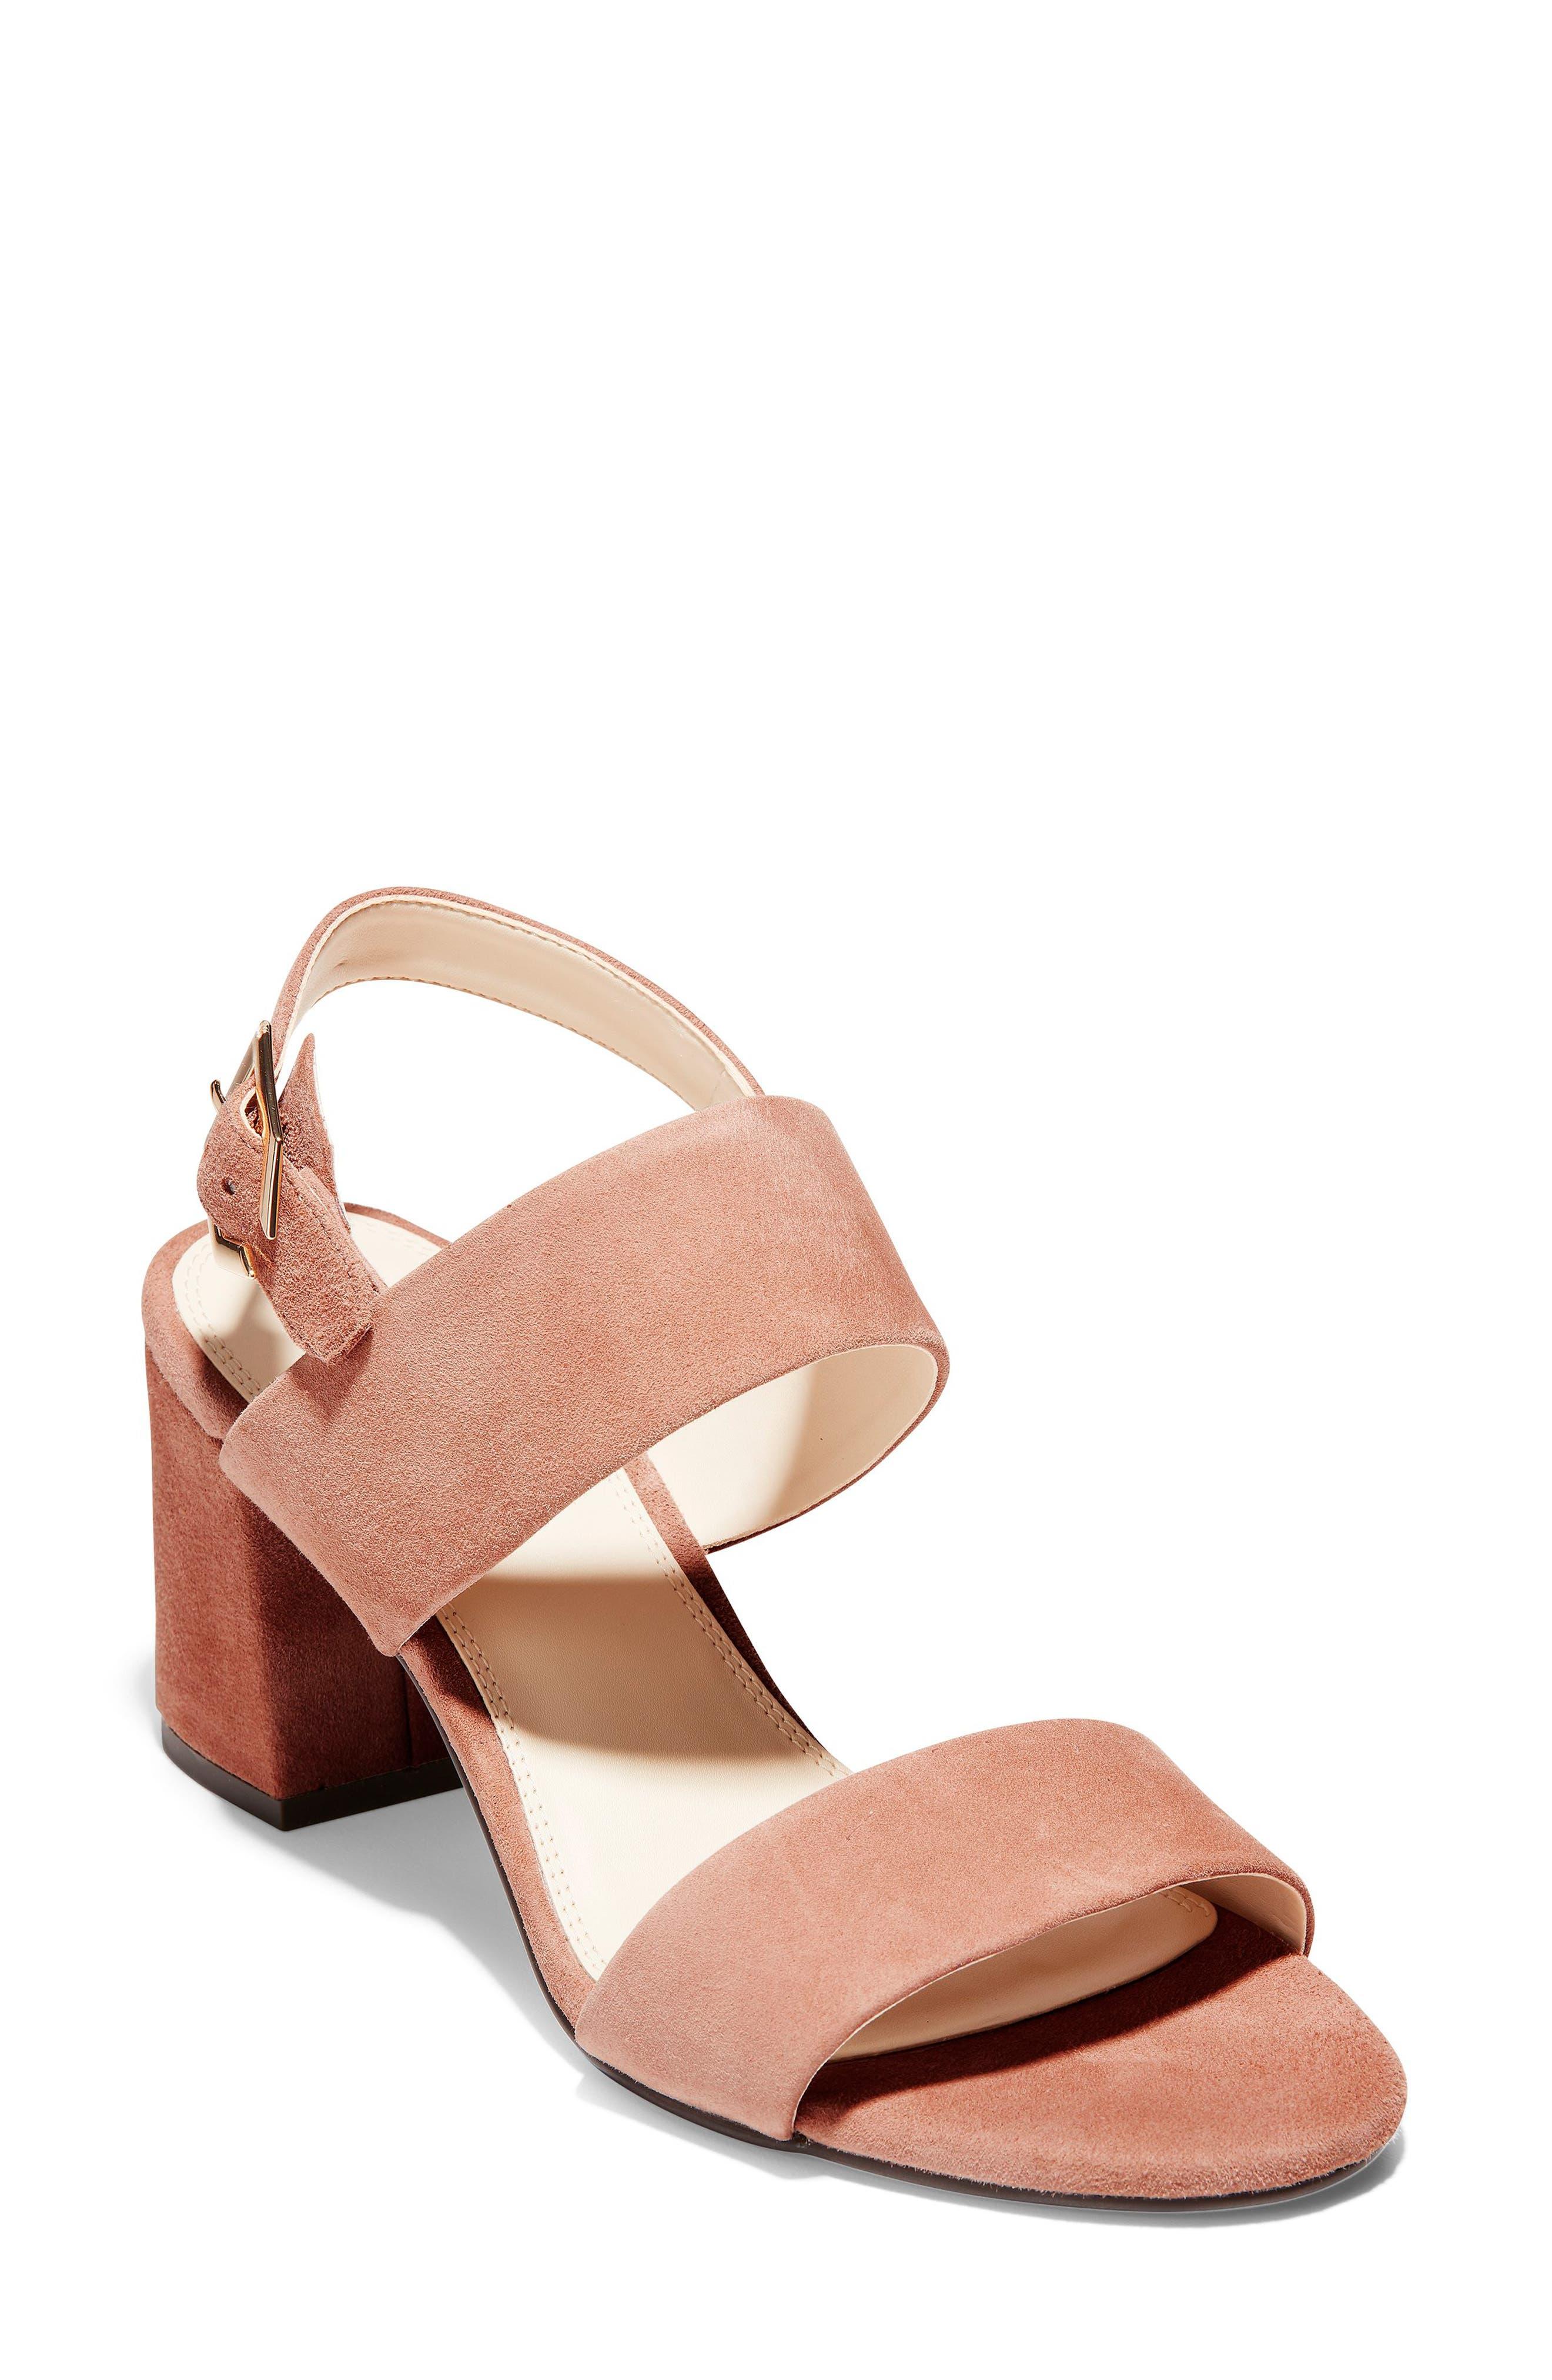 Avani Block Heel Sandal,                             Main thumbnail 1, color,                             MOCHA MOUSSE SUEDE